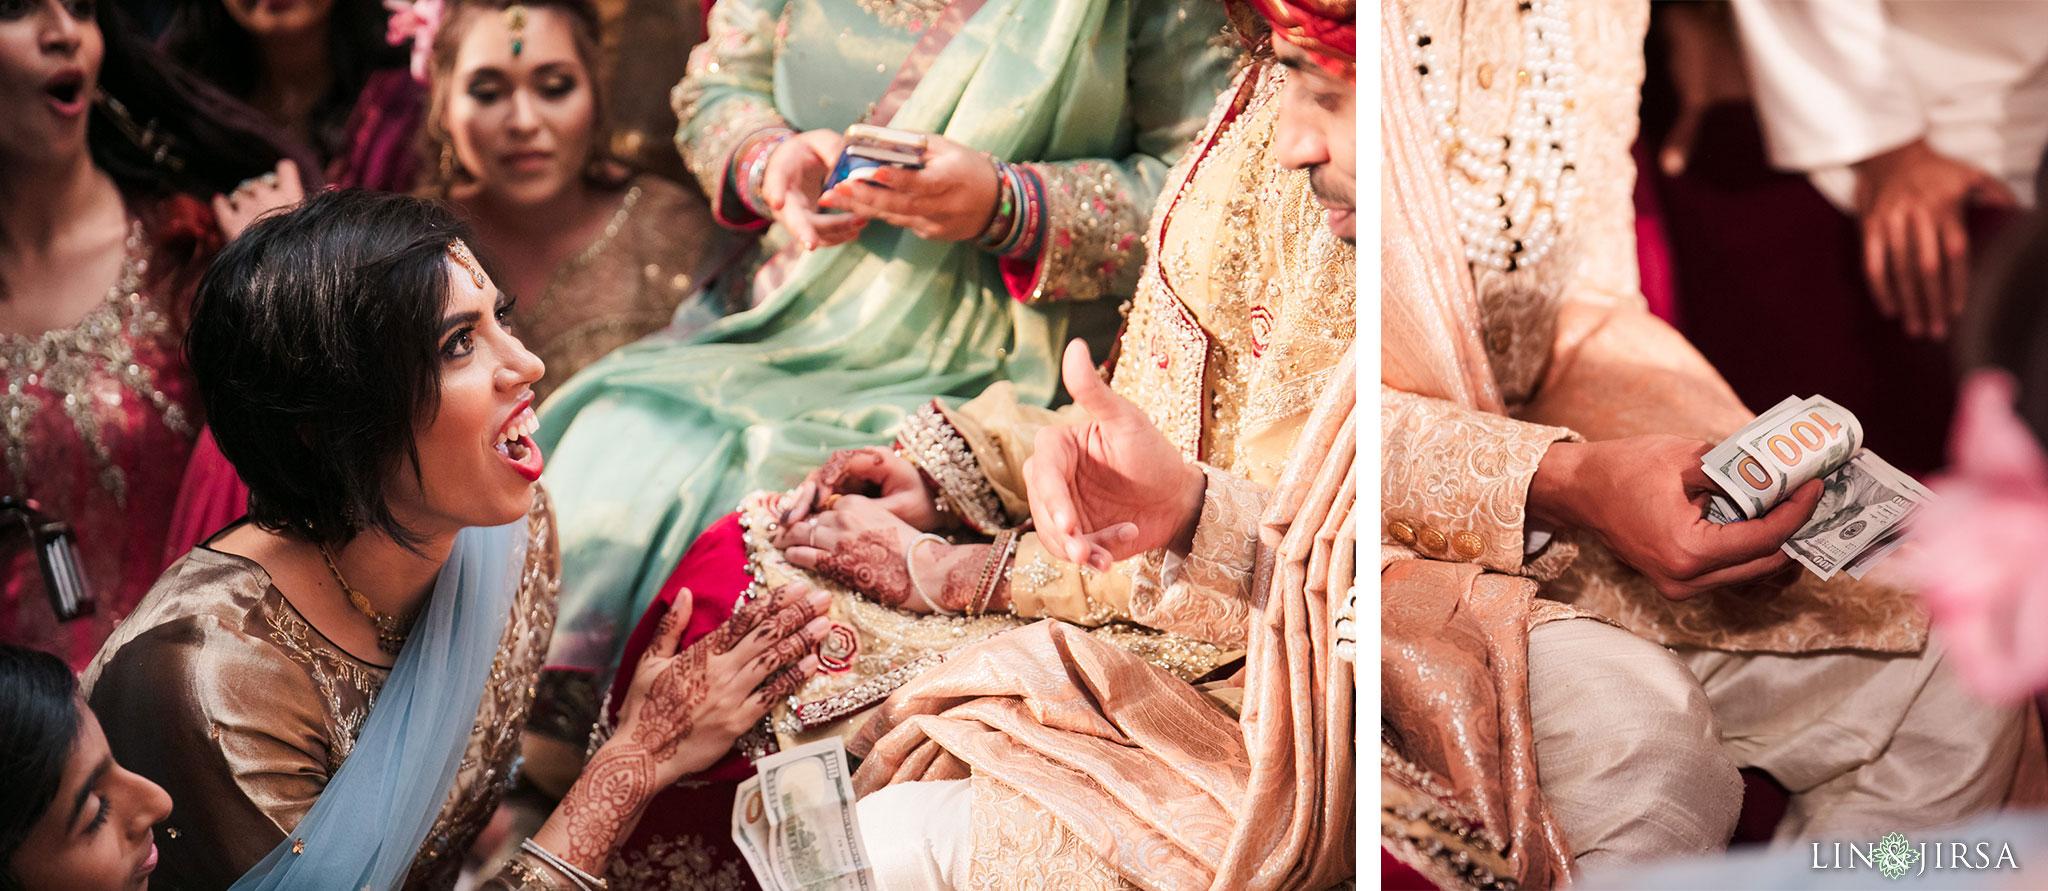 029 four seasons westlake village muslim wedding photography